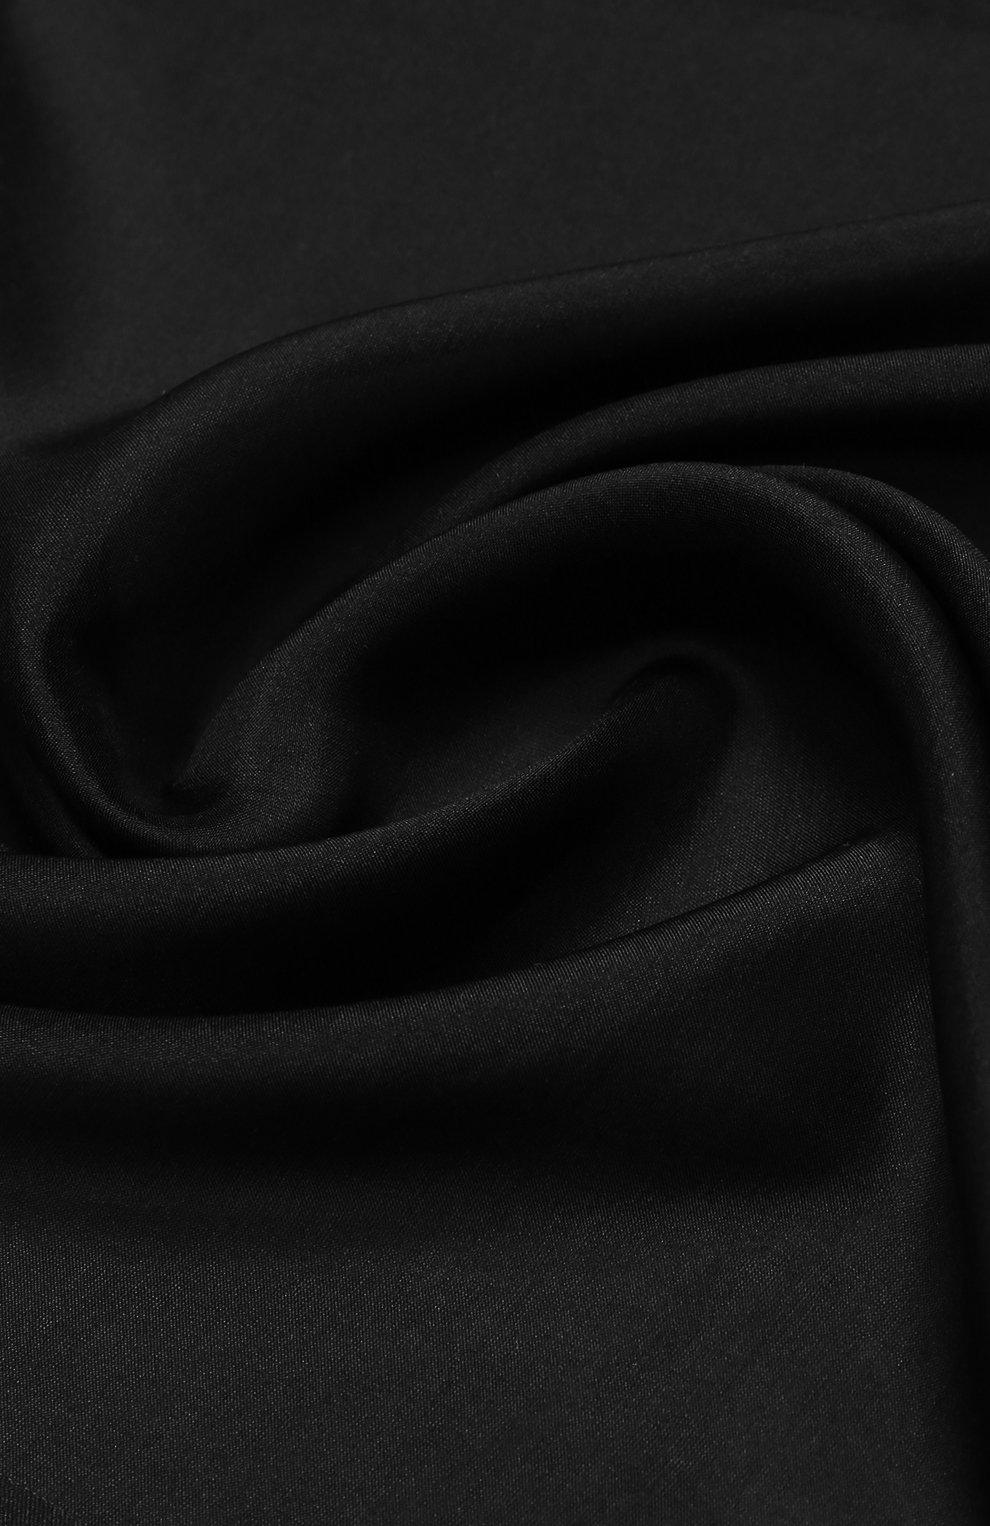 Мужской шелковый платок TOM FORD черного цвета, арт. 4TF86/TF312   Фото 2